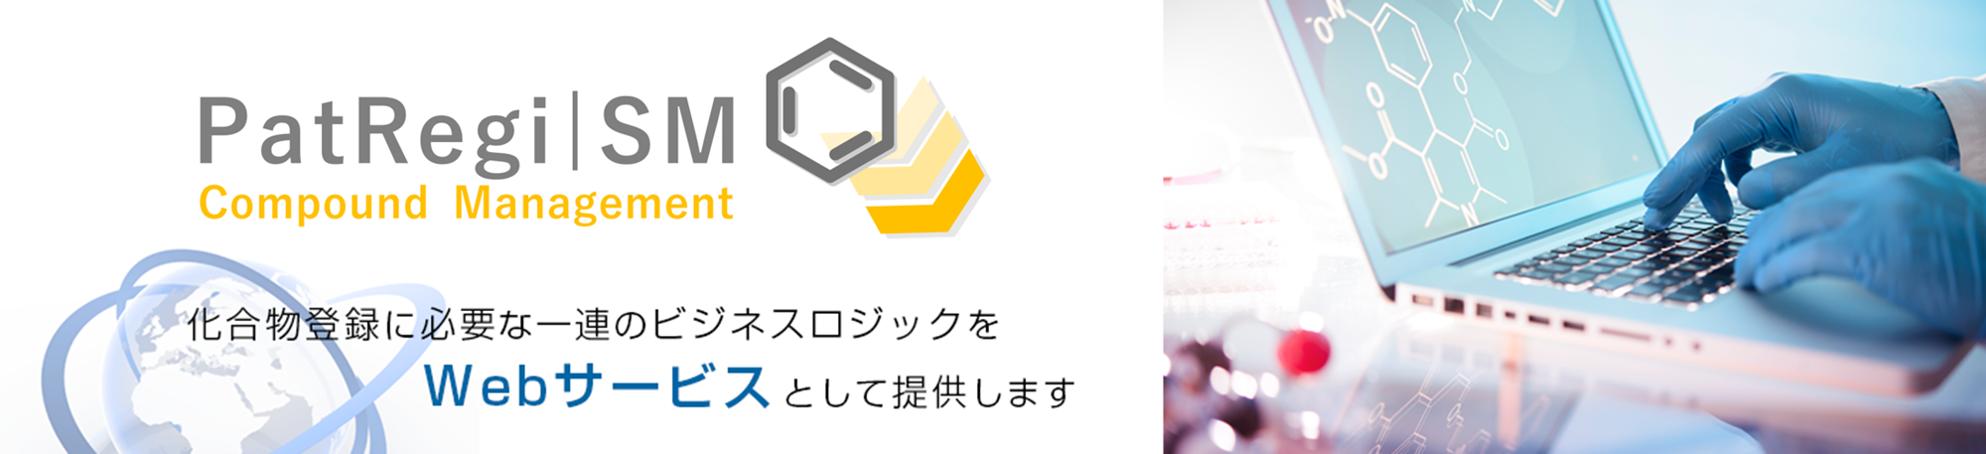 PatRegi|SM:化合物登録システム